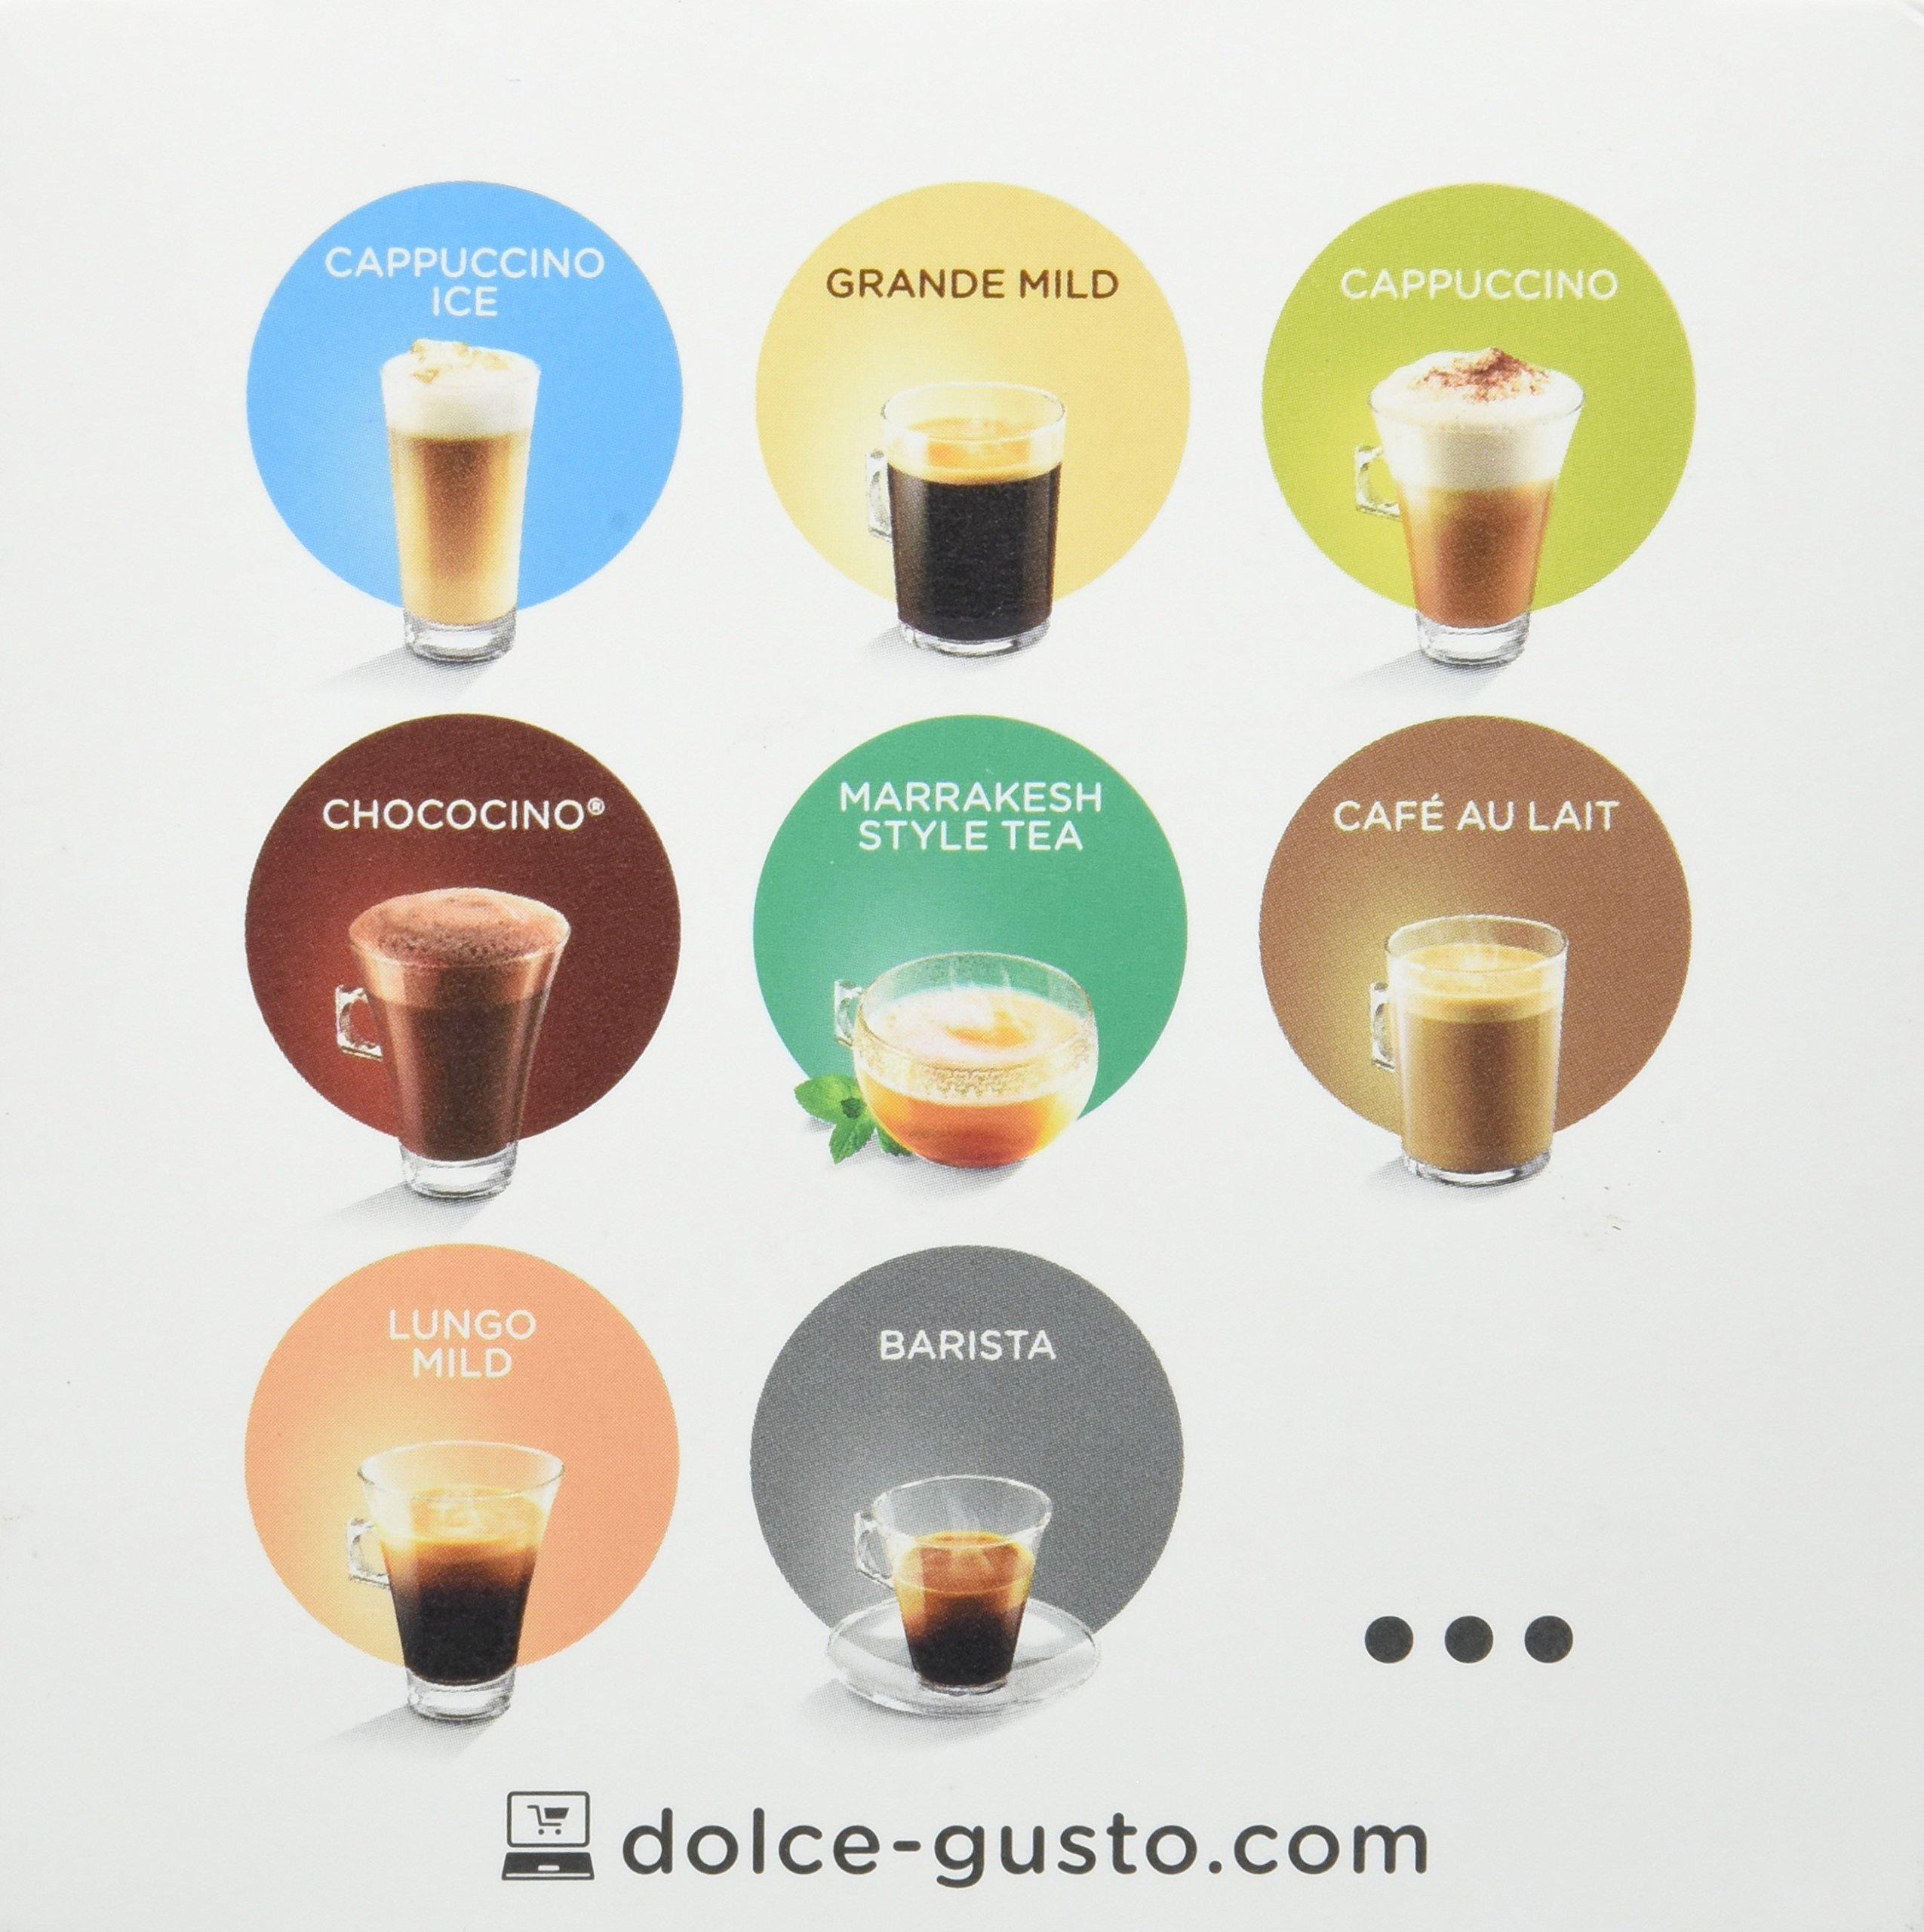 Nescafé Sical - bolsitas y cápsulas de café (Cápsula de café, Café expreso, Caja): Amazon.es: Alimentación y bebidas